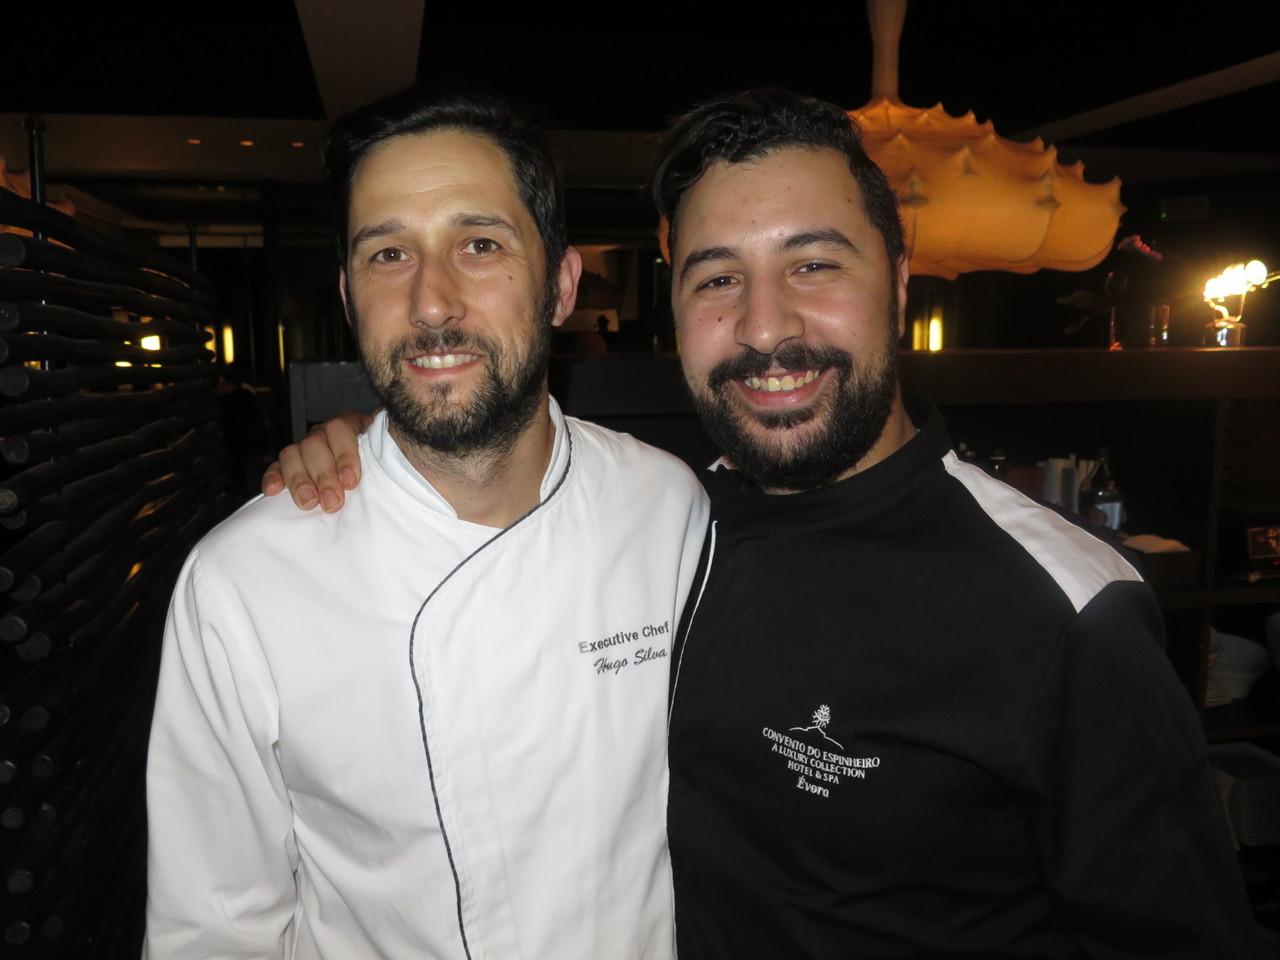 Hugo Silva e Bouazza Bouhlani